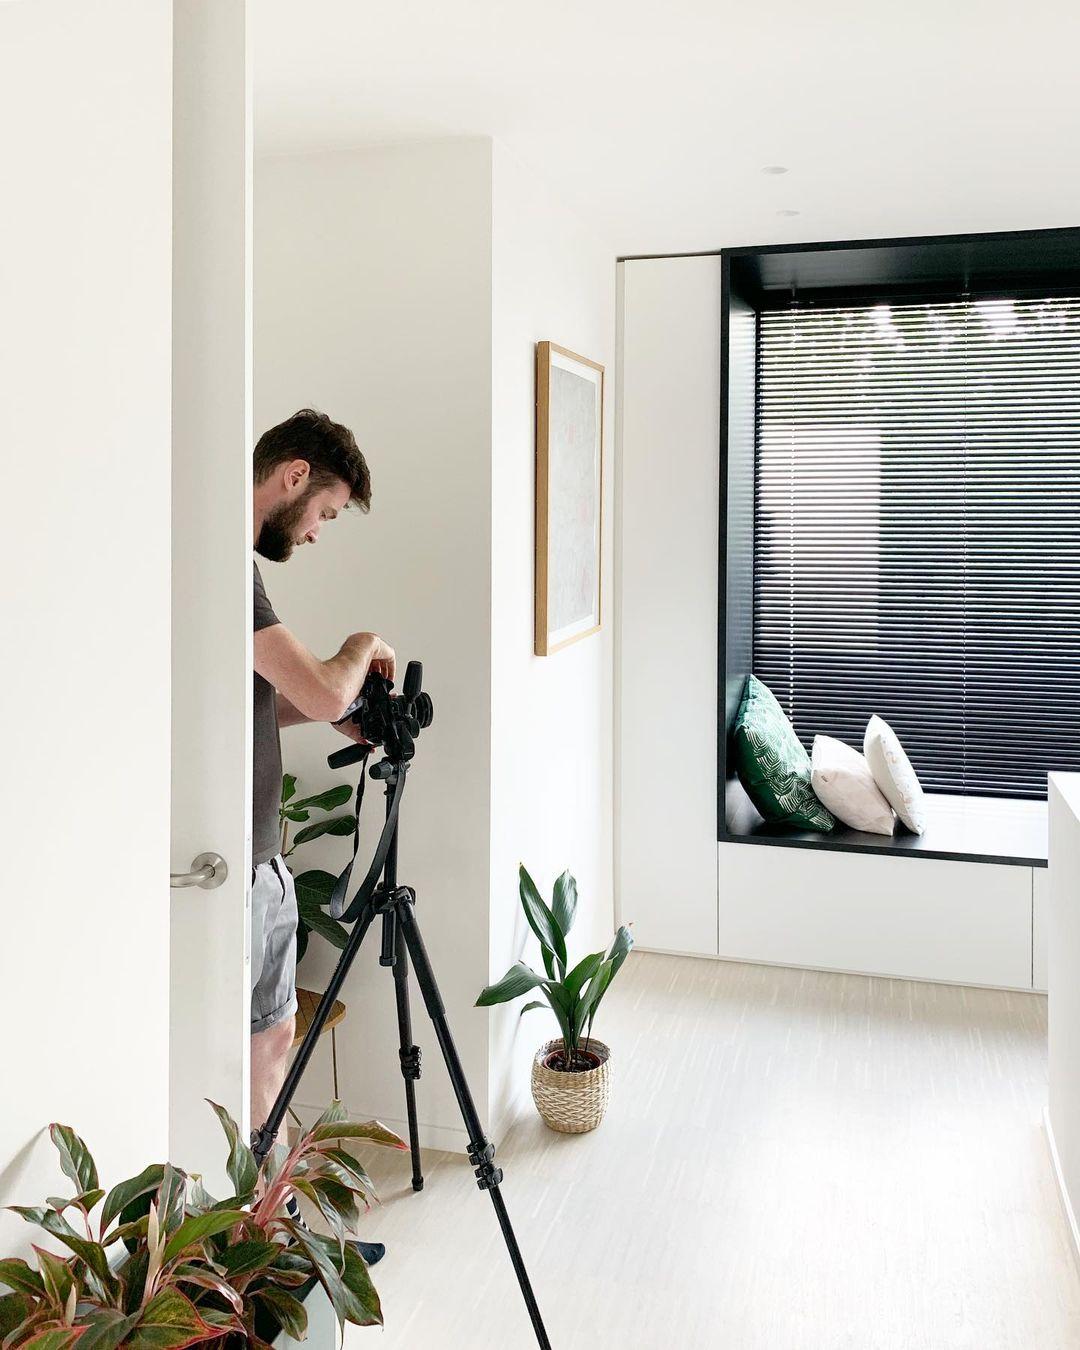 2019 06 21 By97RJ otej 2071072067366868899 | Baeyens & Beck architecten Gent | architect nieuwbouw renovatie interieur | high end | architectenbureau